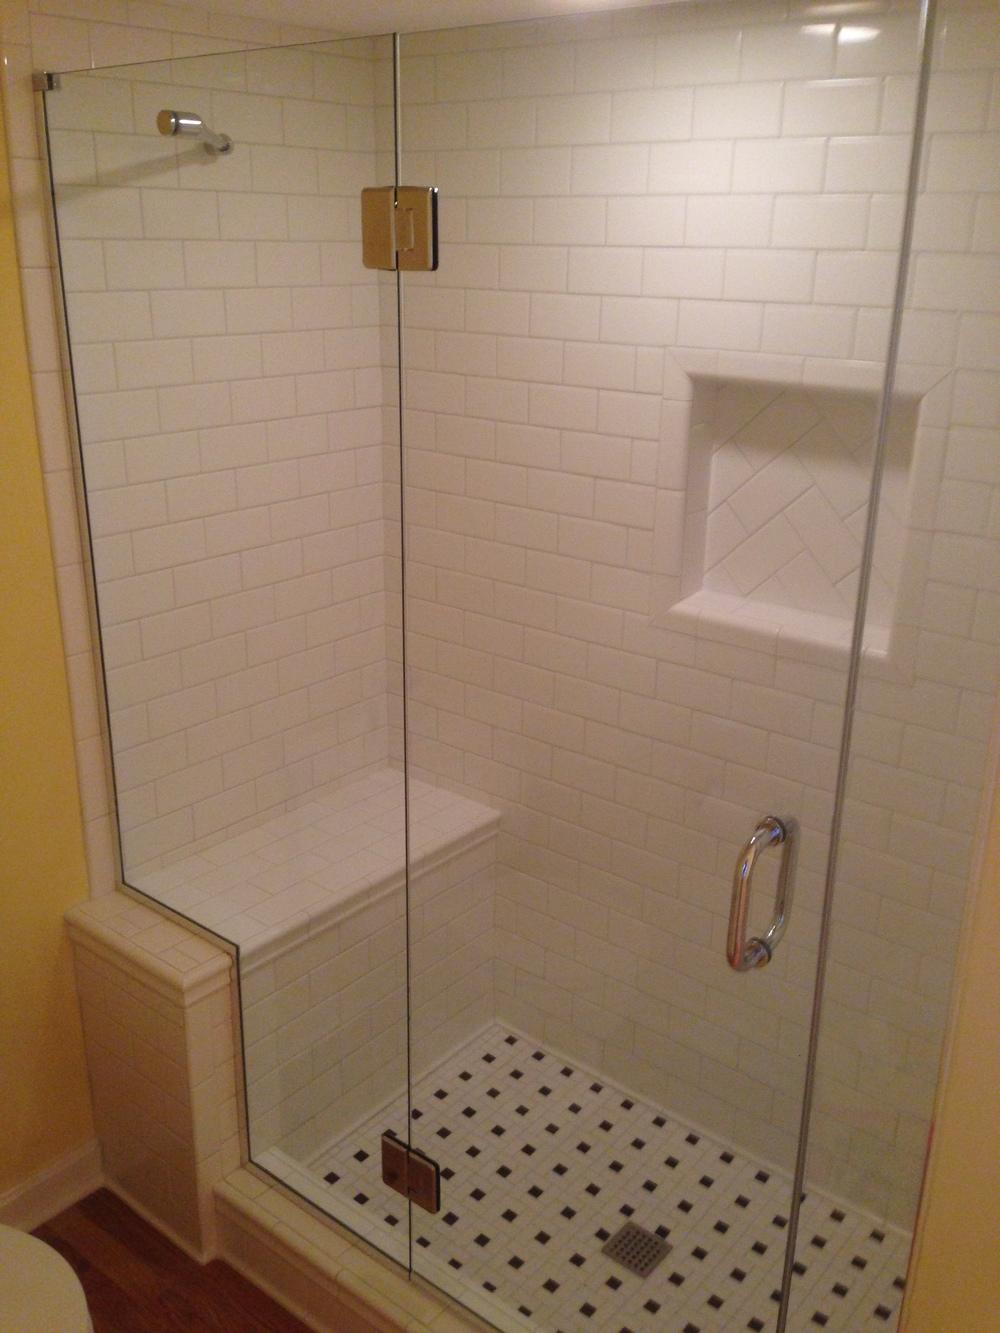 Converting Tub To Walk In Shower Bathroom Renovations